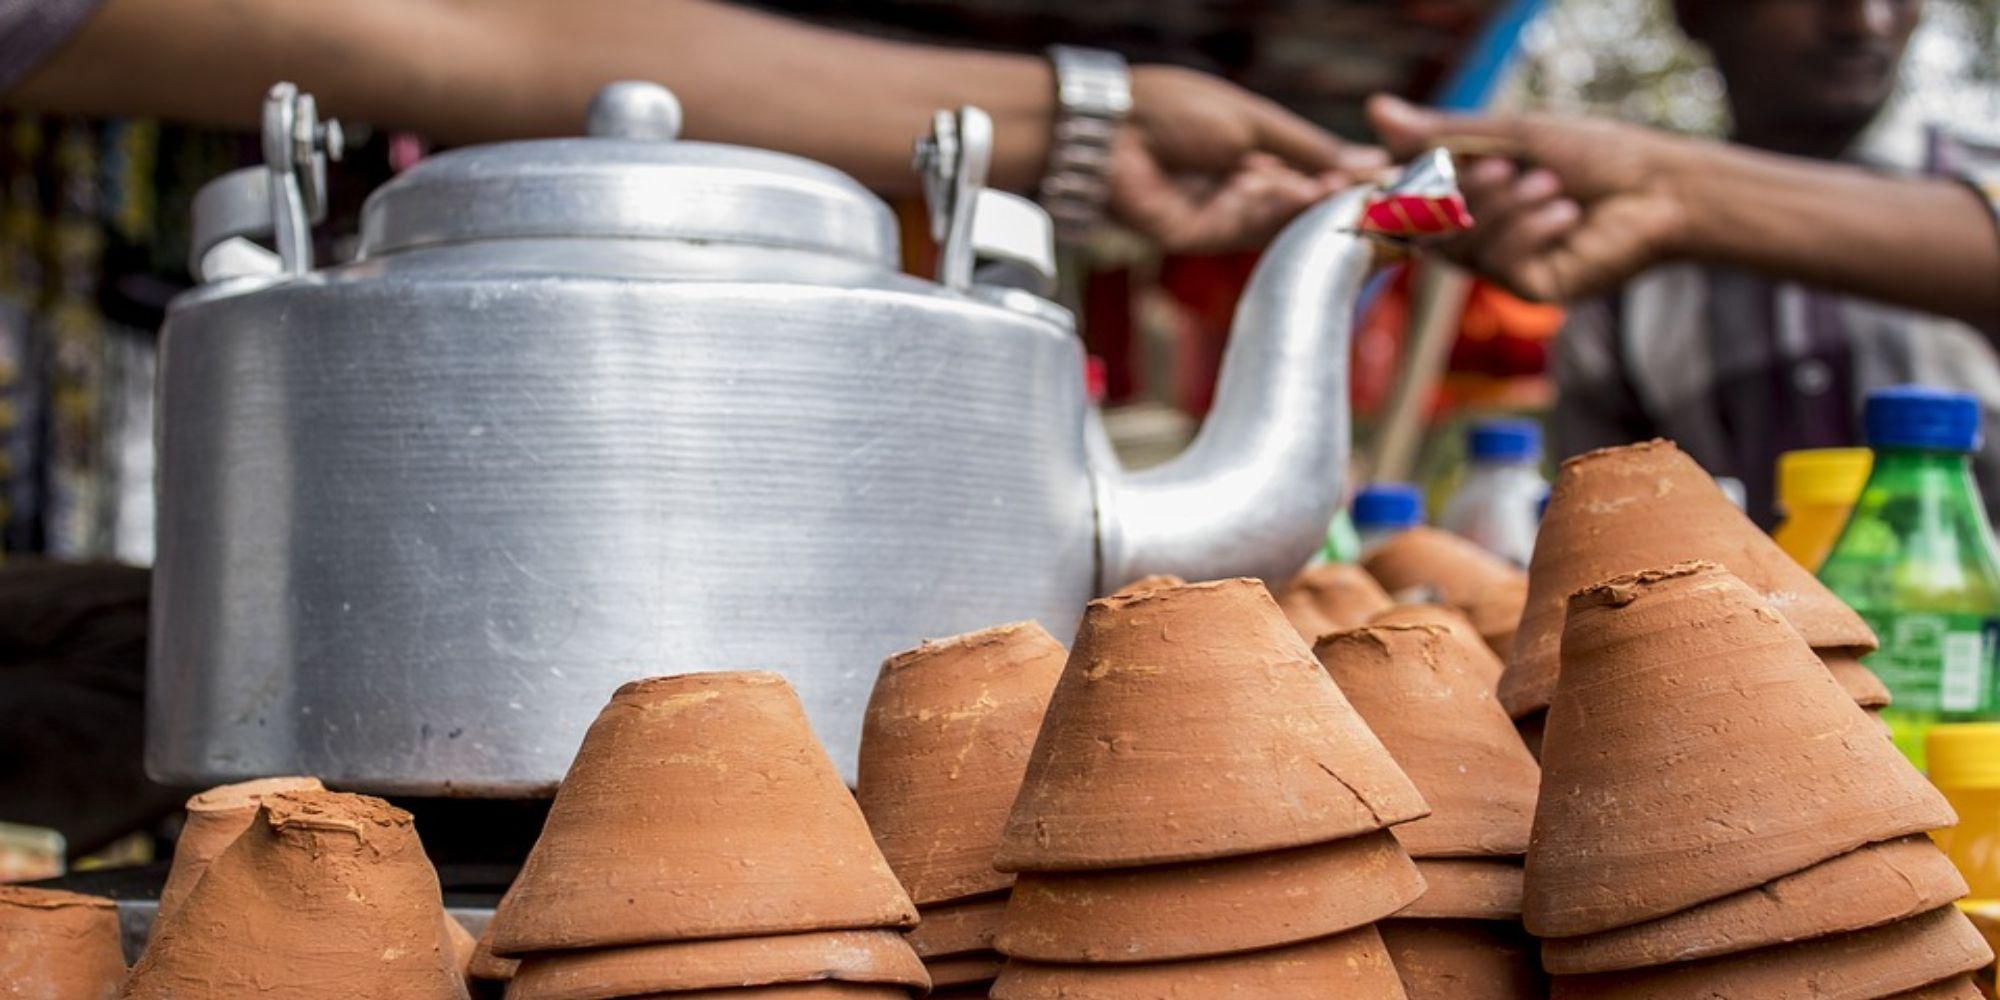 Ankit Nagwanshi – Famous engineer chaiwala. The success story of an engineer turned tea seller in Madhya Pradesh